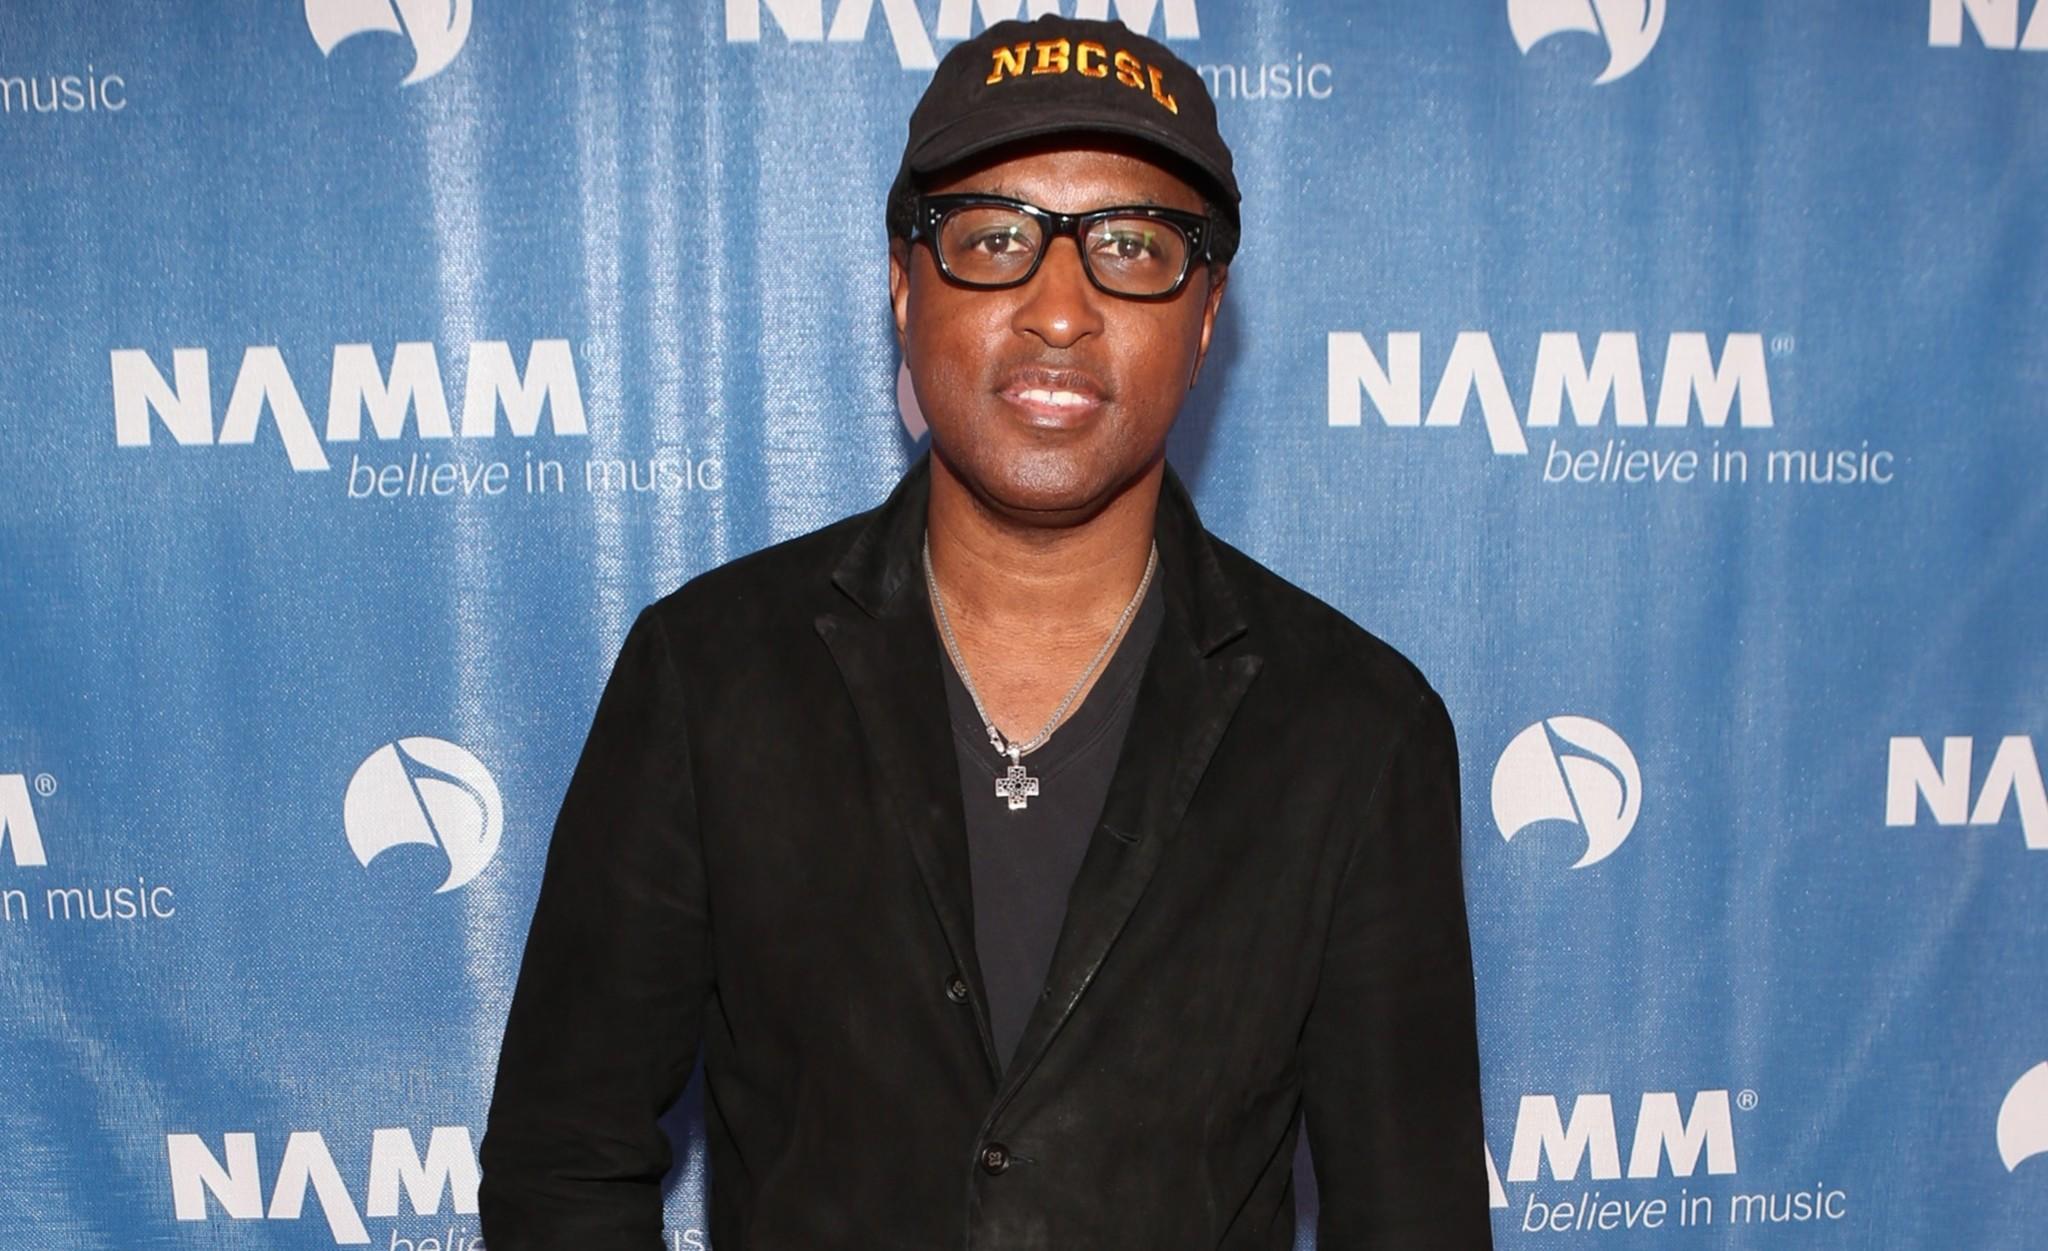 R&B icon Babyface, real name Kenny Edmonds, is engaged to longtime girlfriend Nicole Patenburg.